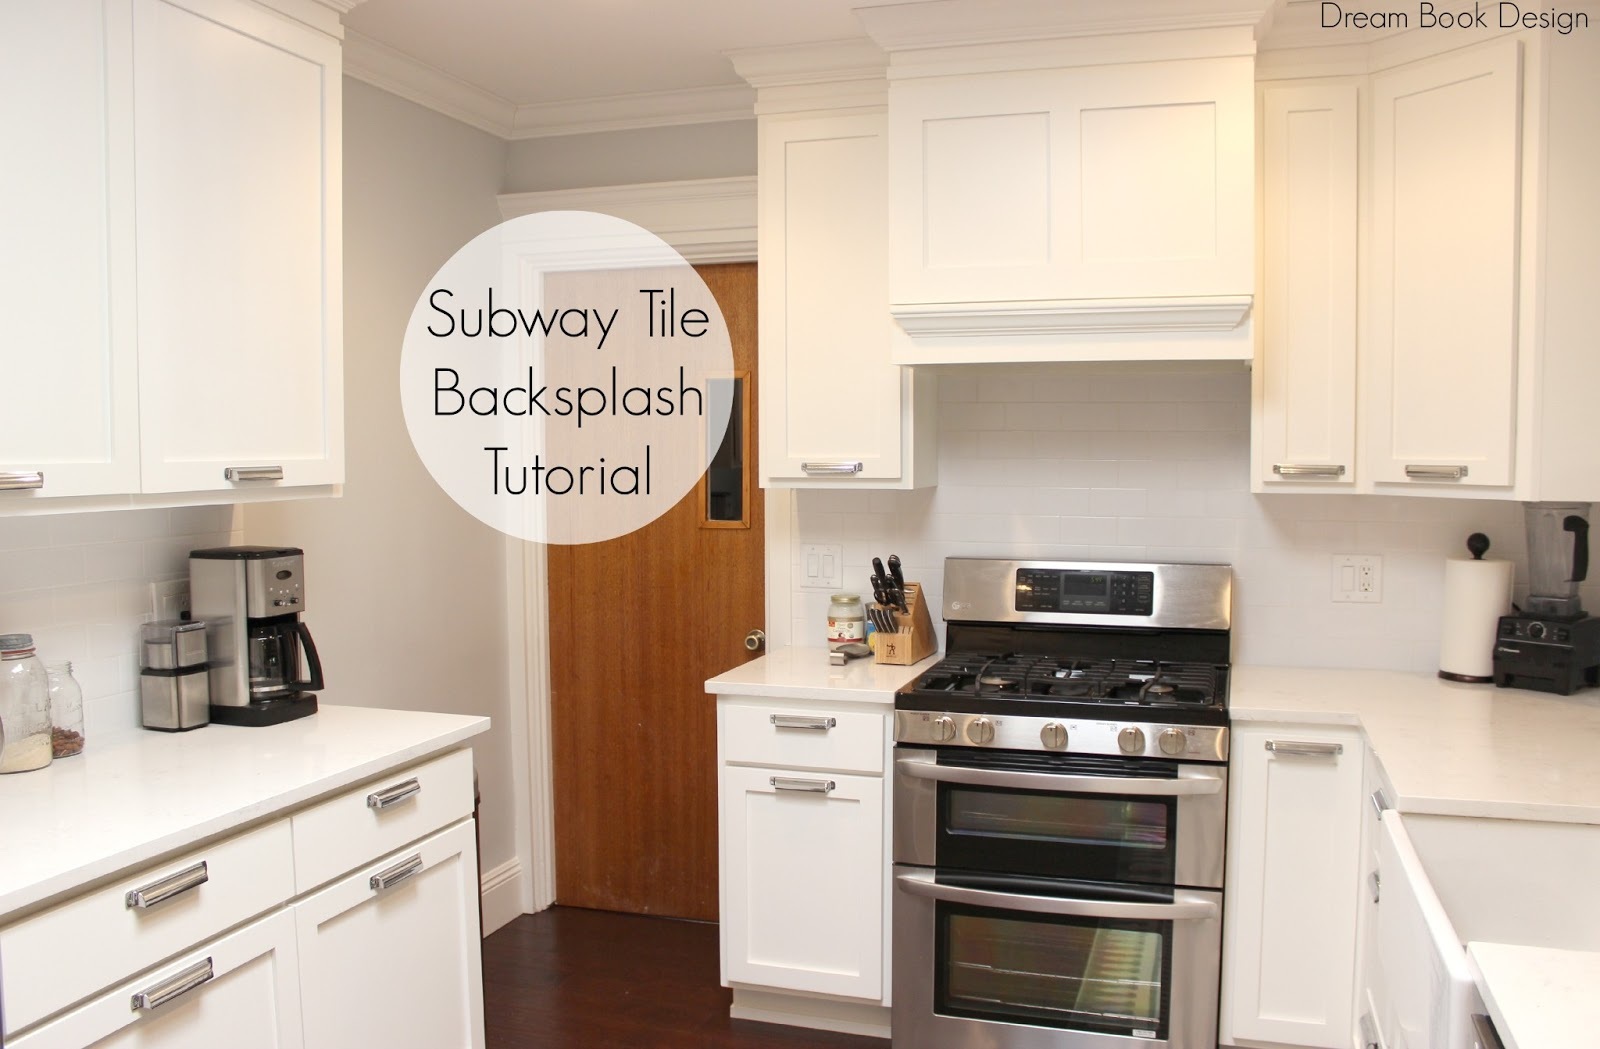 easy diy subway tile backsplash tutorial kitchen backsplash subway tile Easy DIY Subway Tile Backsplash Tutorial